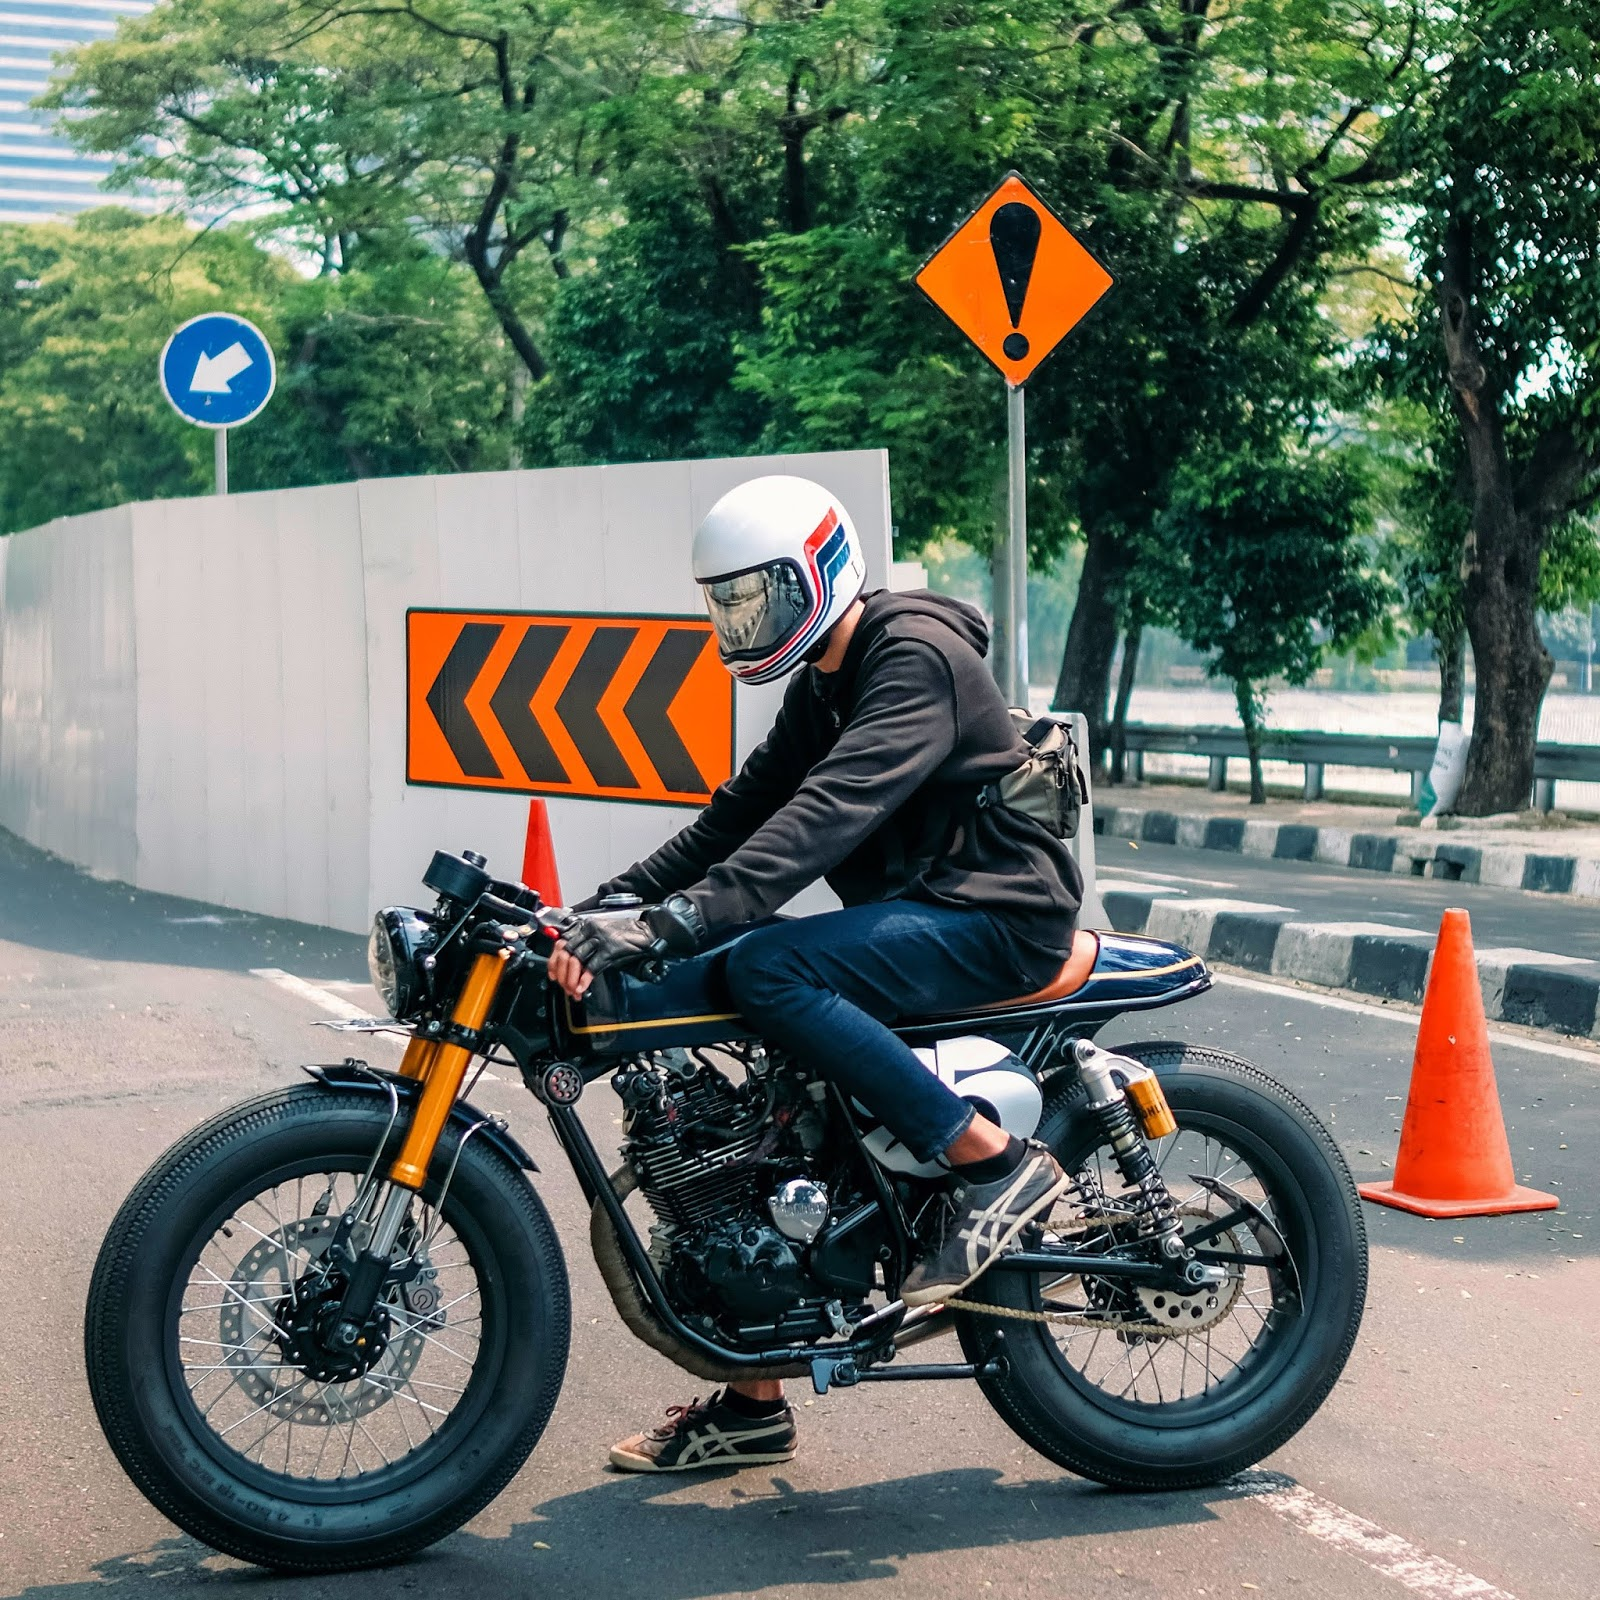 Identik, Simple dan Elegan - Yamaha Scorpio 225 Cafe Racer